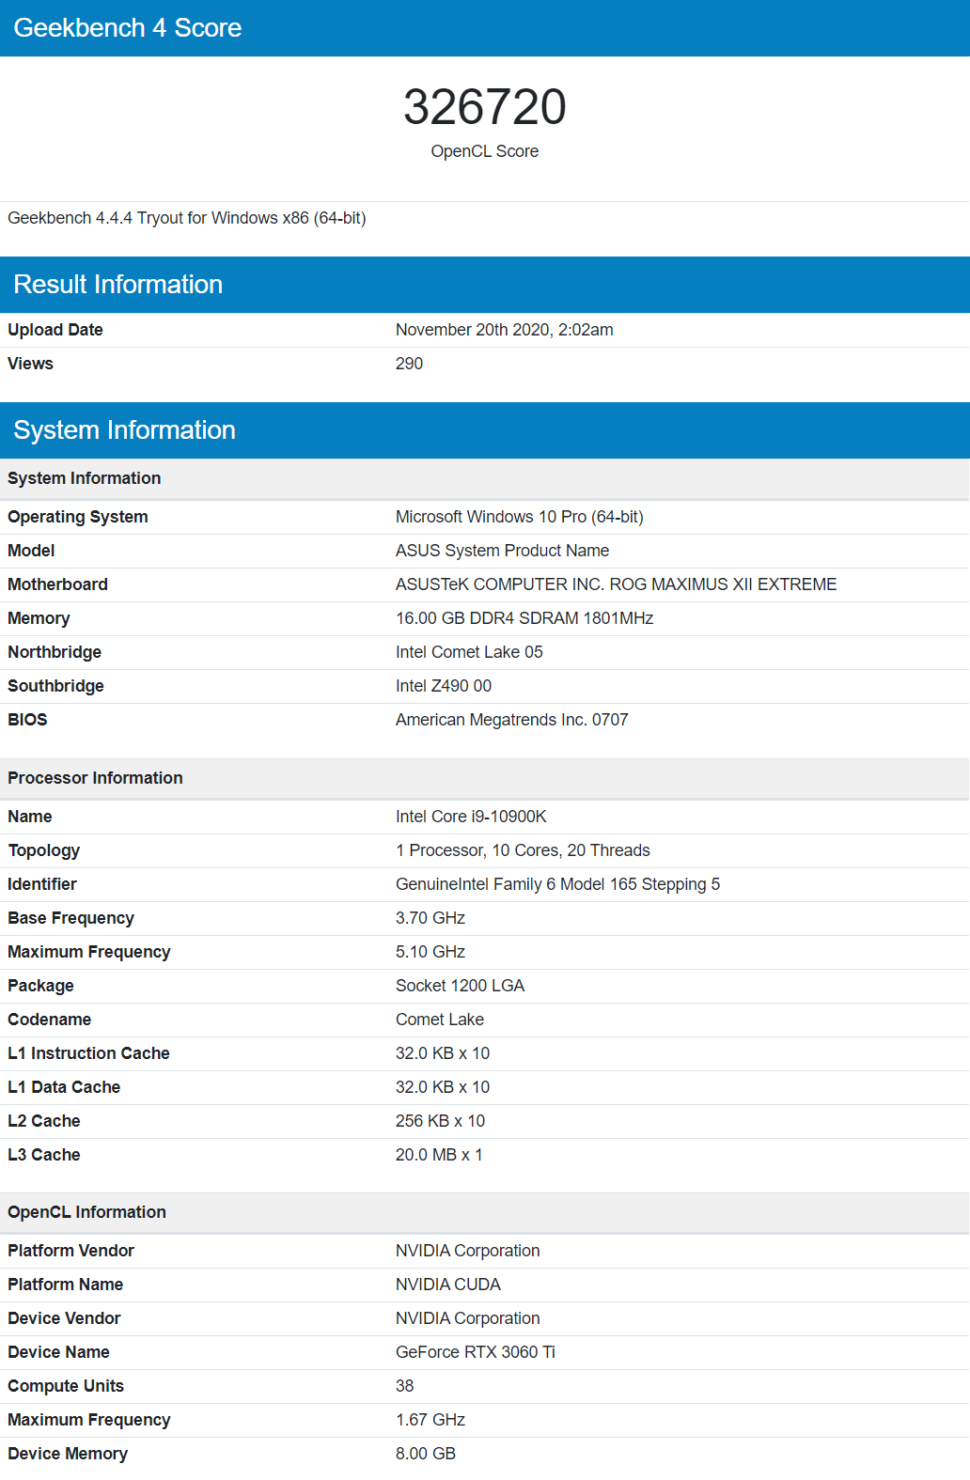 nvidia-geforce-rtx-3060-ti-geekbench-leaked-benchmarks_4